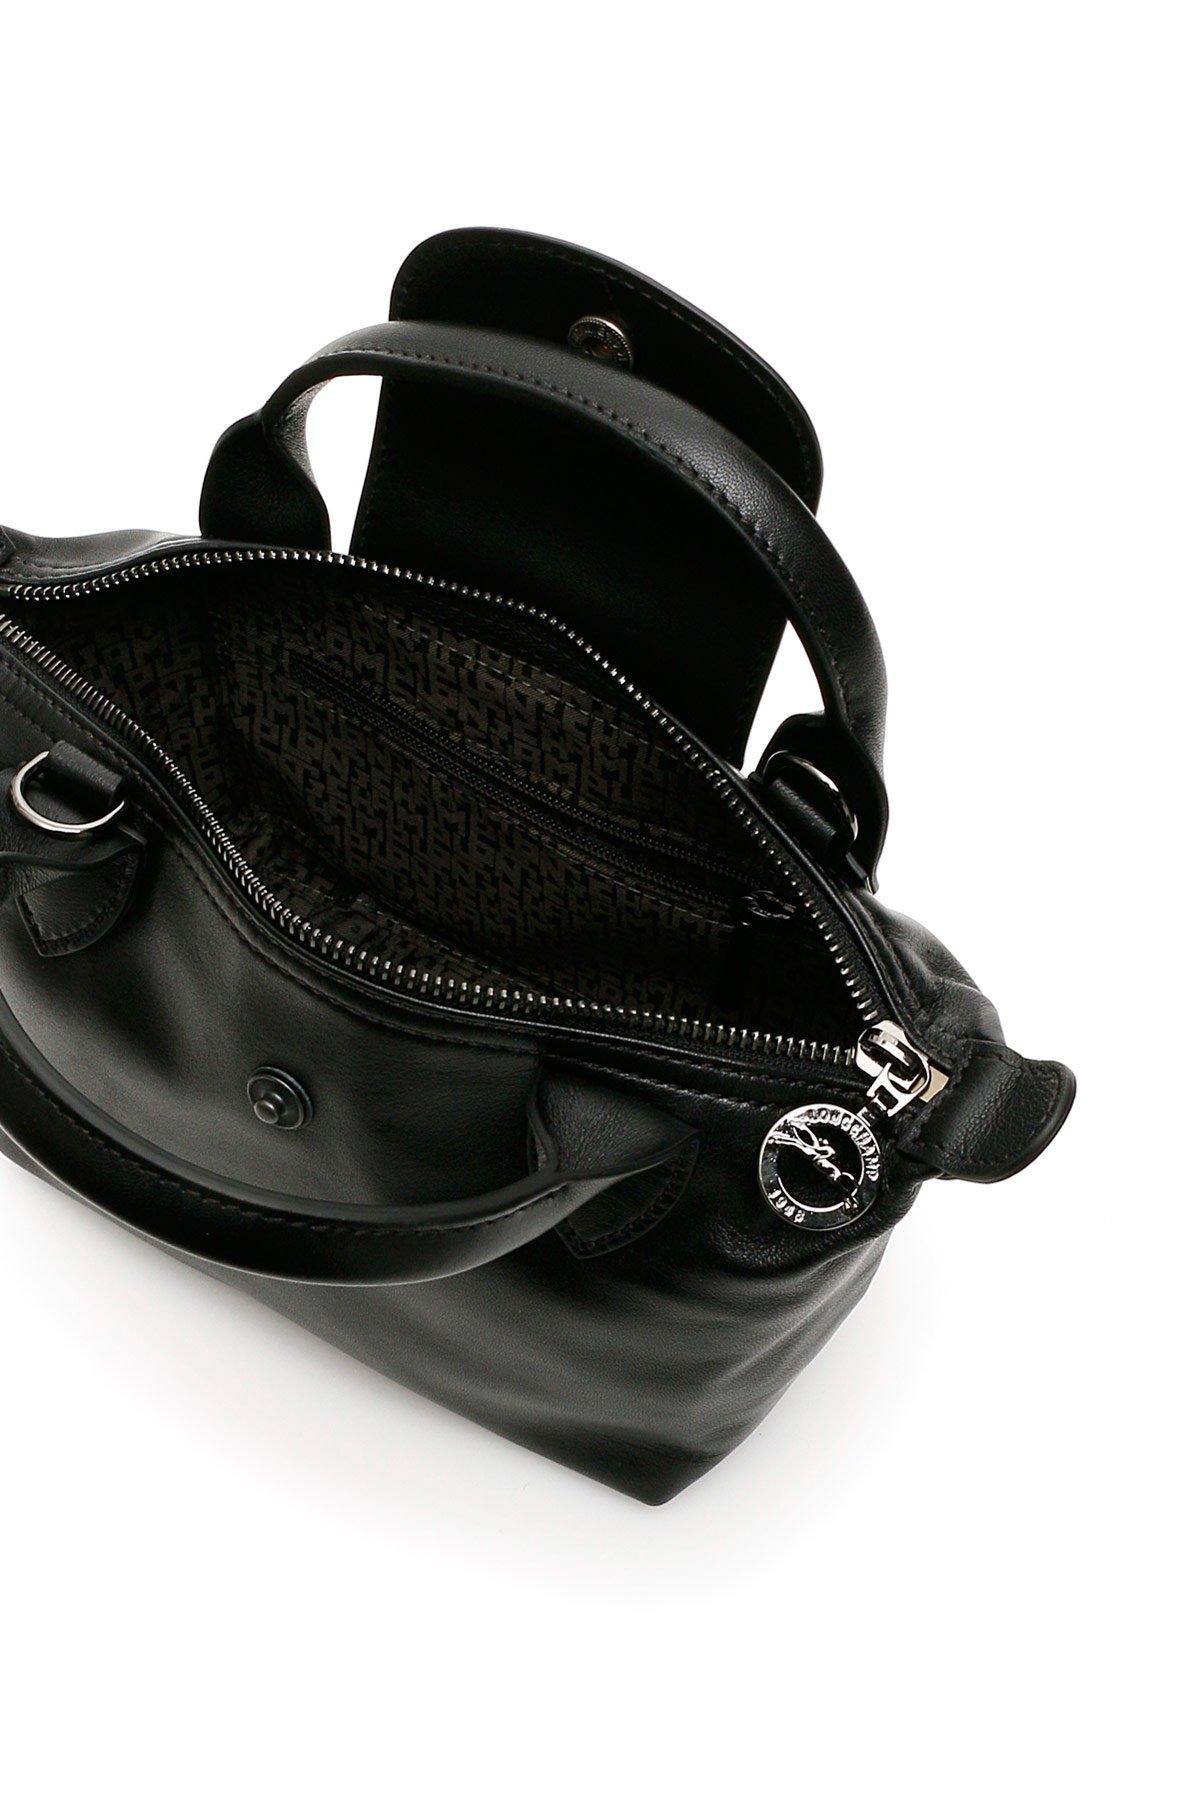 Longchamp borsa a mano logo le pliage cuir mini